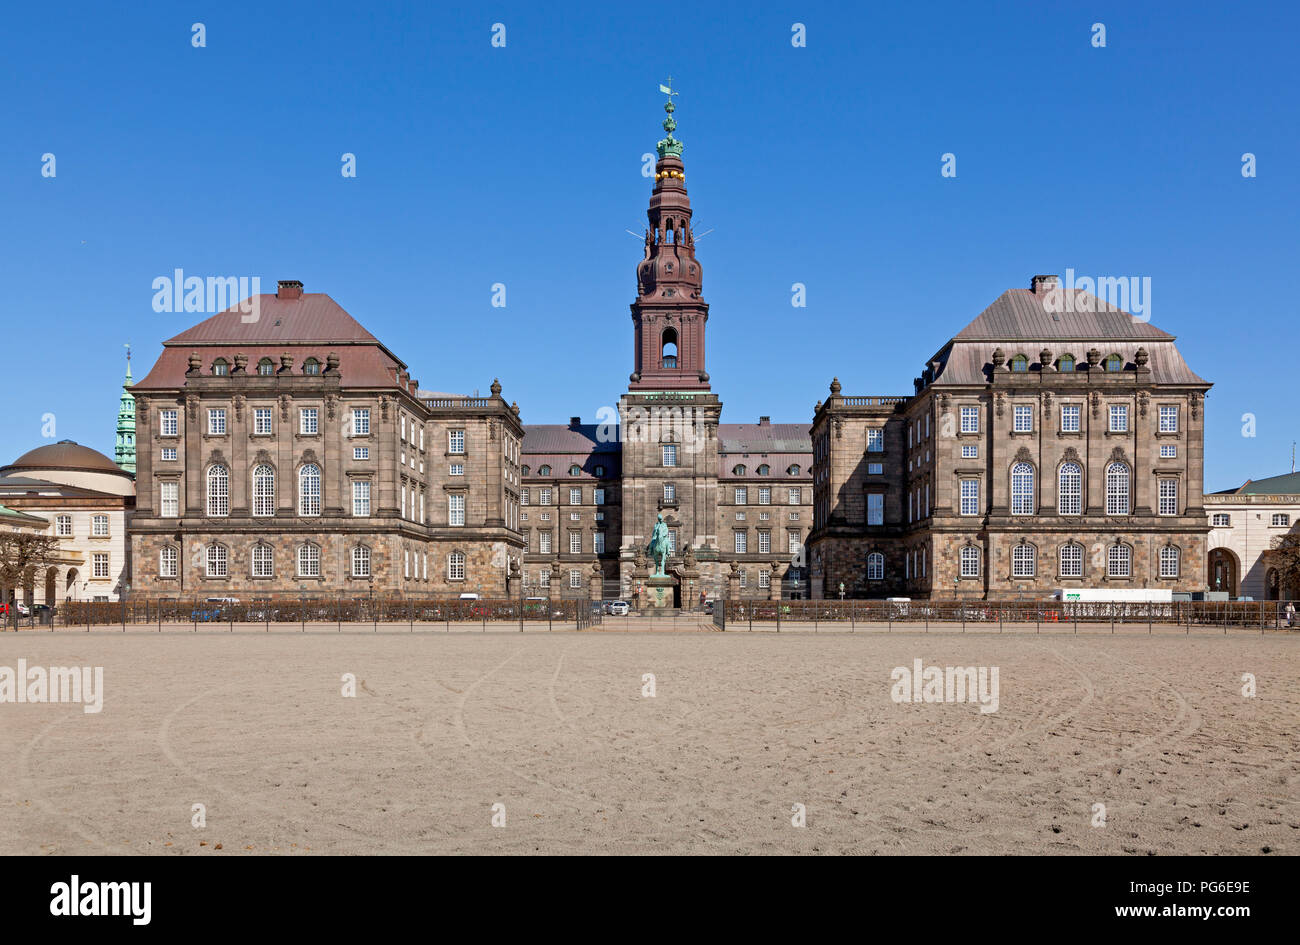 Christiansborg Castle seen from the Riding Grounds, Copenhagen, Denmark Stock Photo